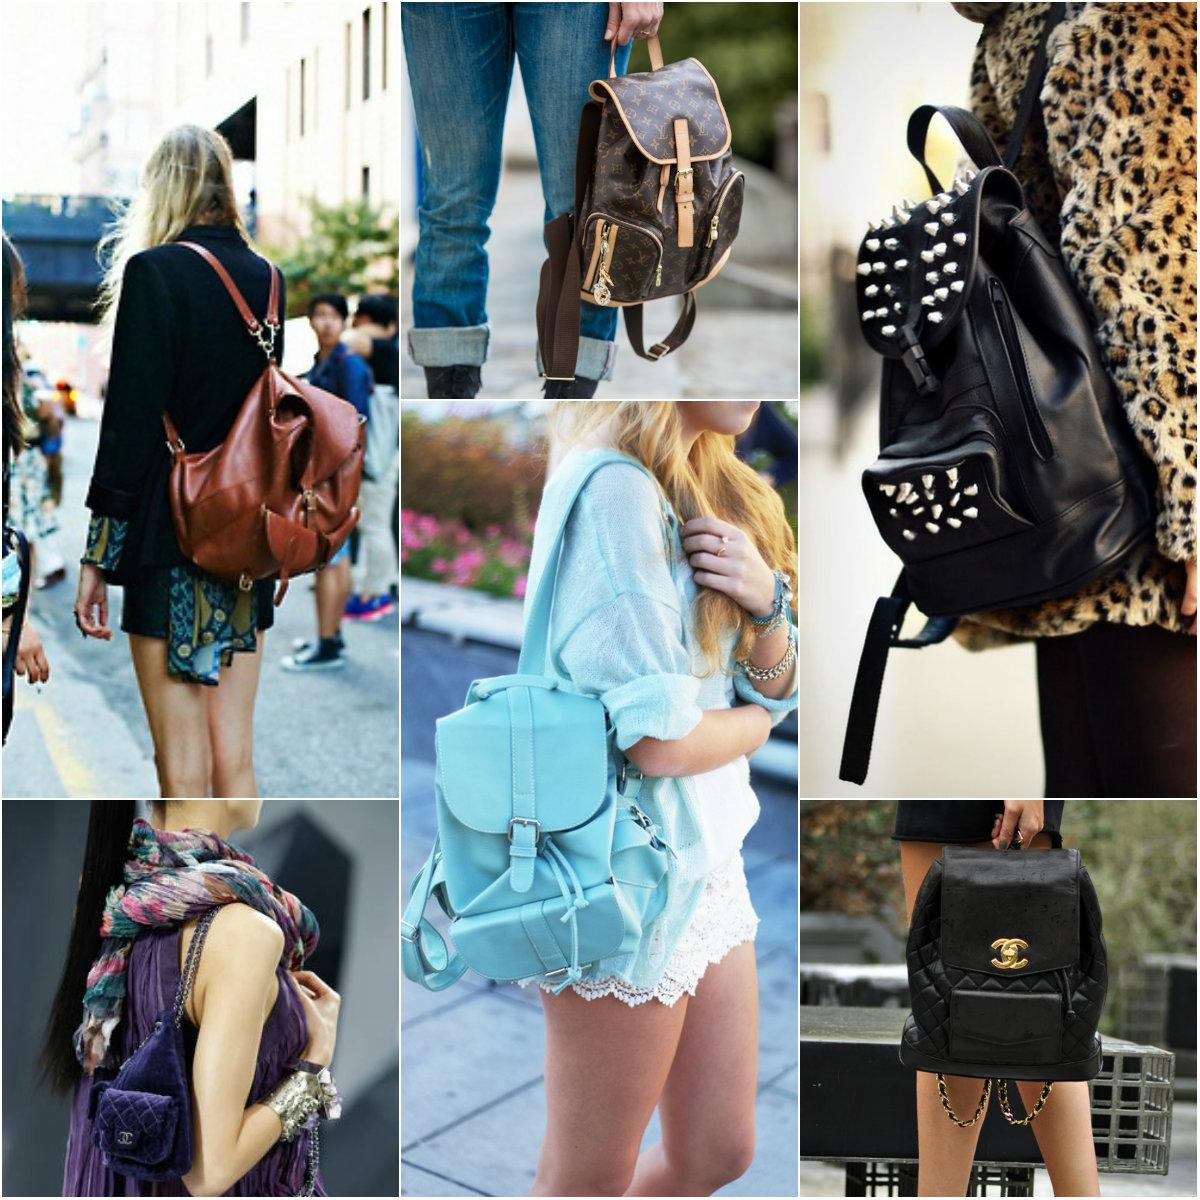 mochila de couro feminina